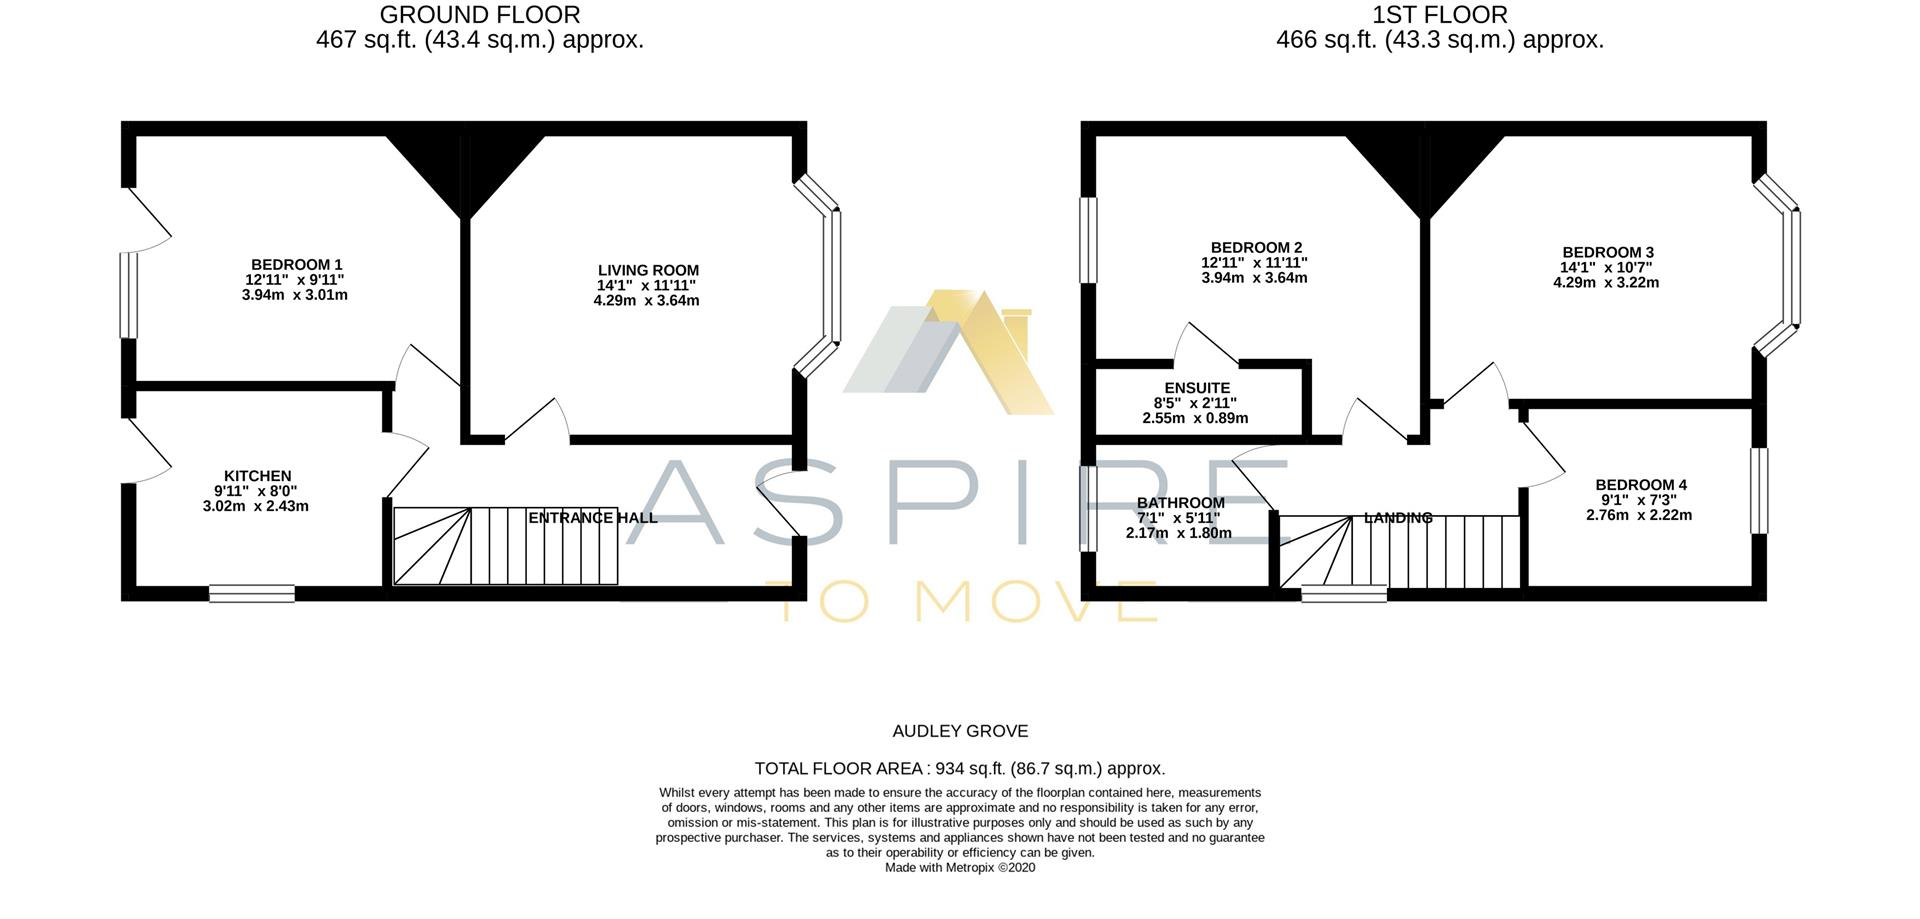 16 Audley Grove floorplan.jpg